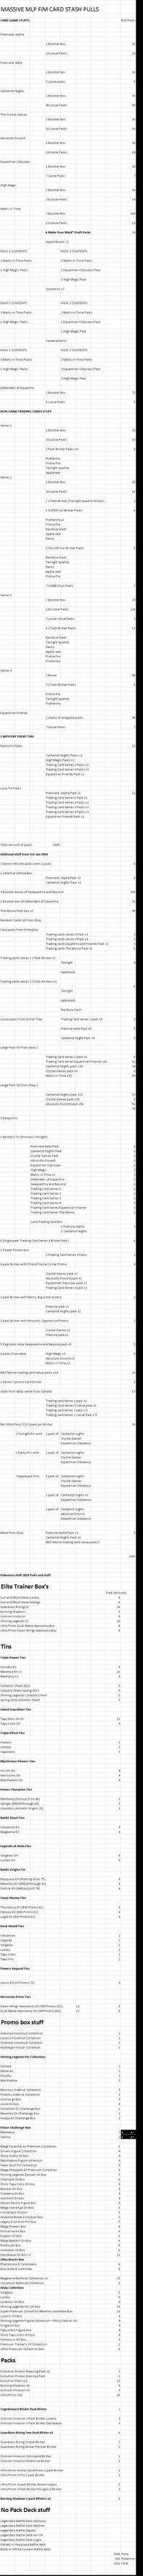 2018 Unopened Stuff So Far Pokemon and MLP:FiM TCG by kaisernathan1701